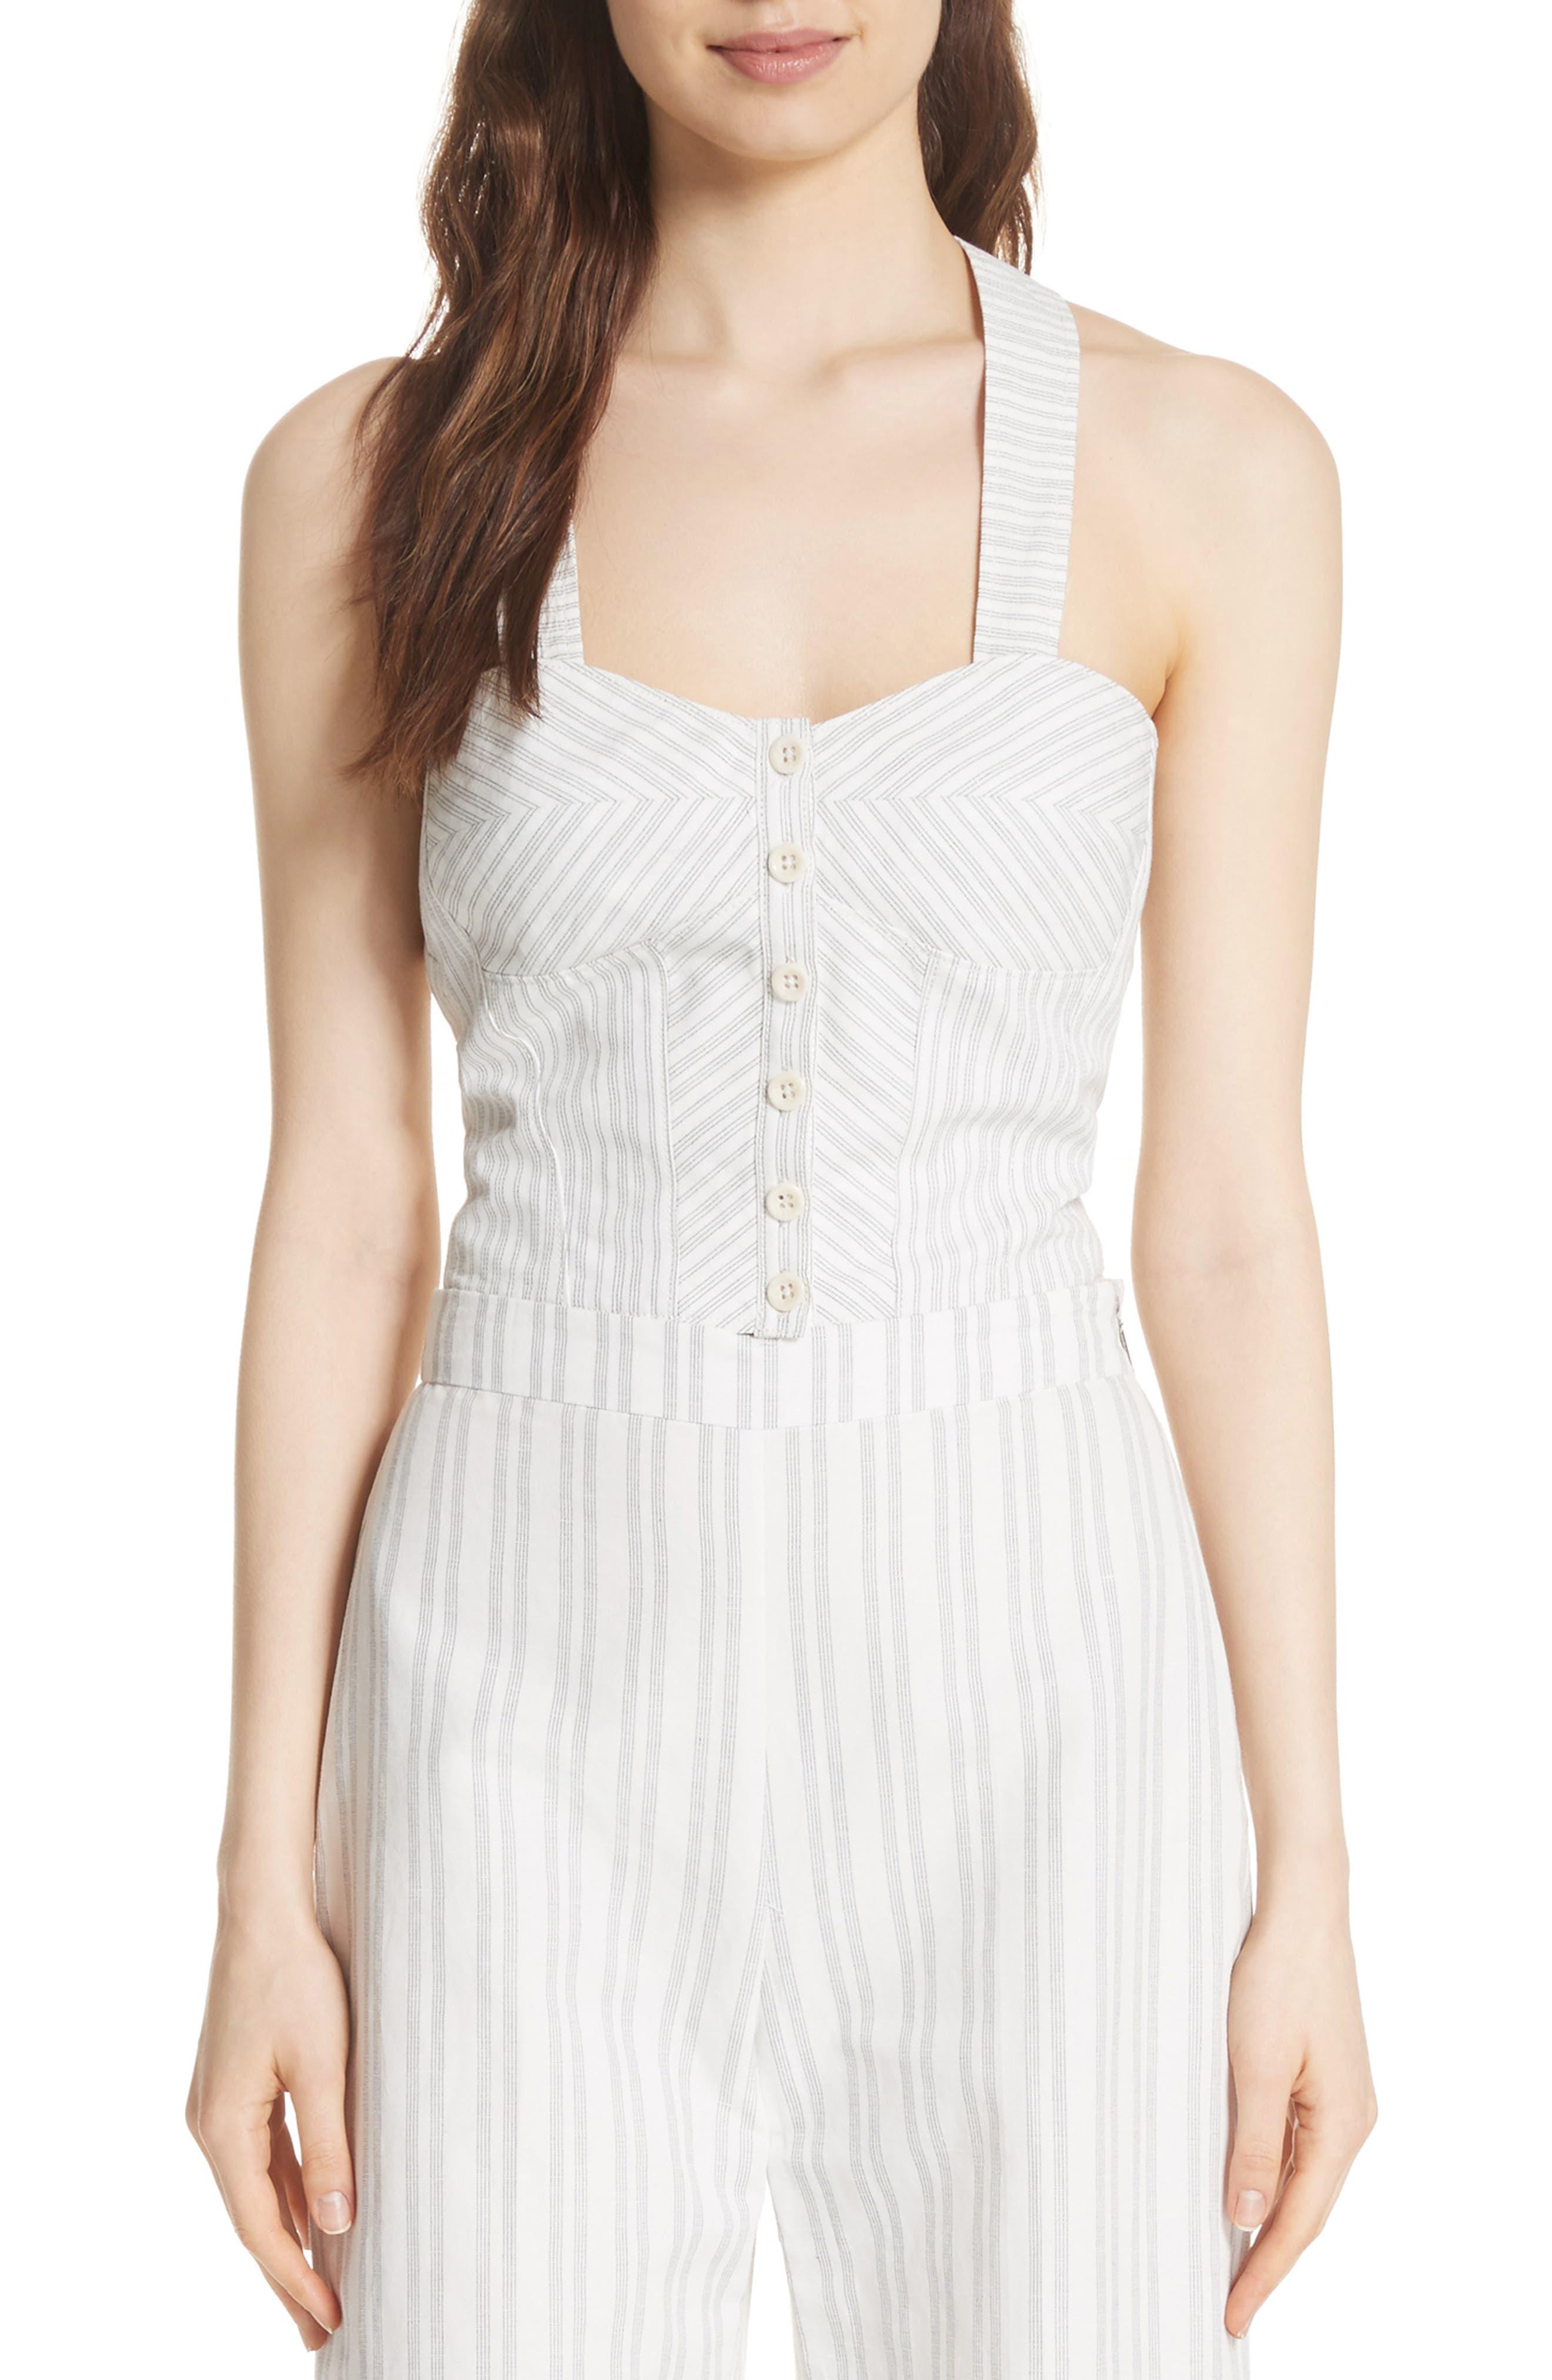 Main Image - Rebecca Taylor Crisscross Back Stripe Cotton Linen Top